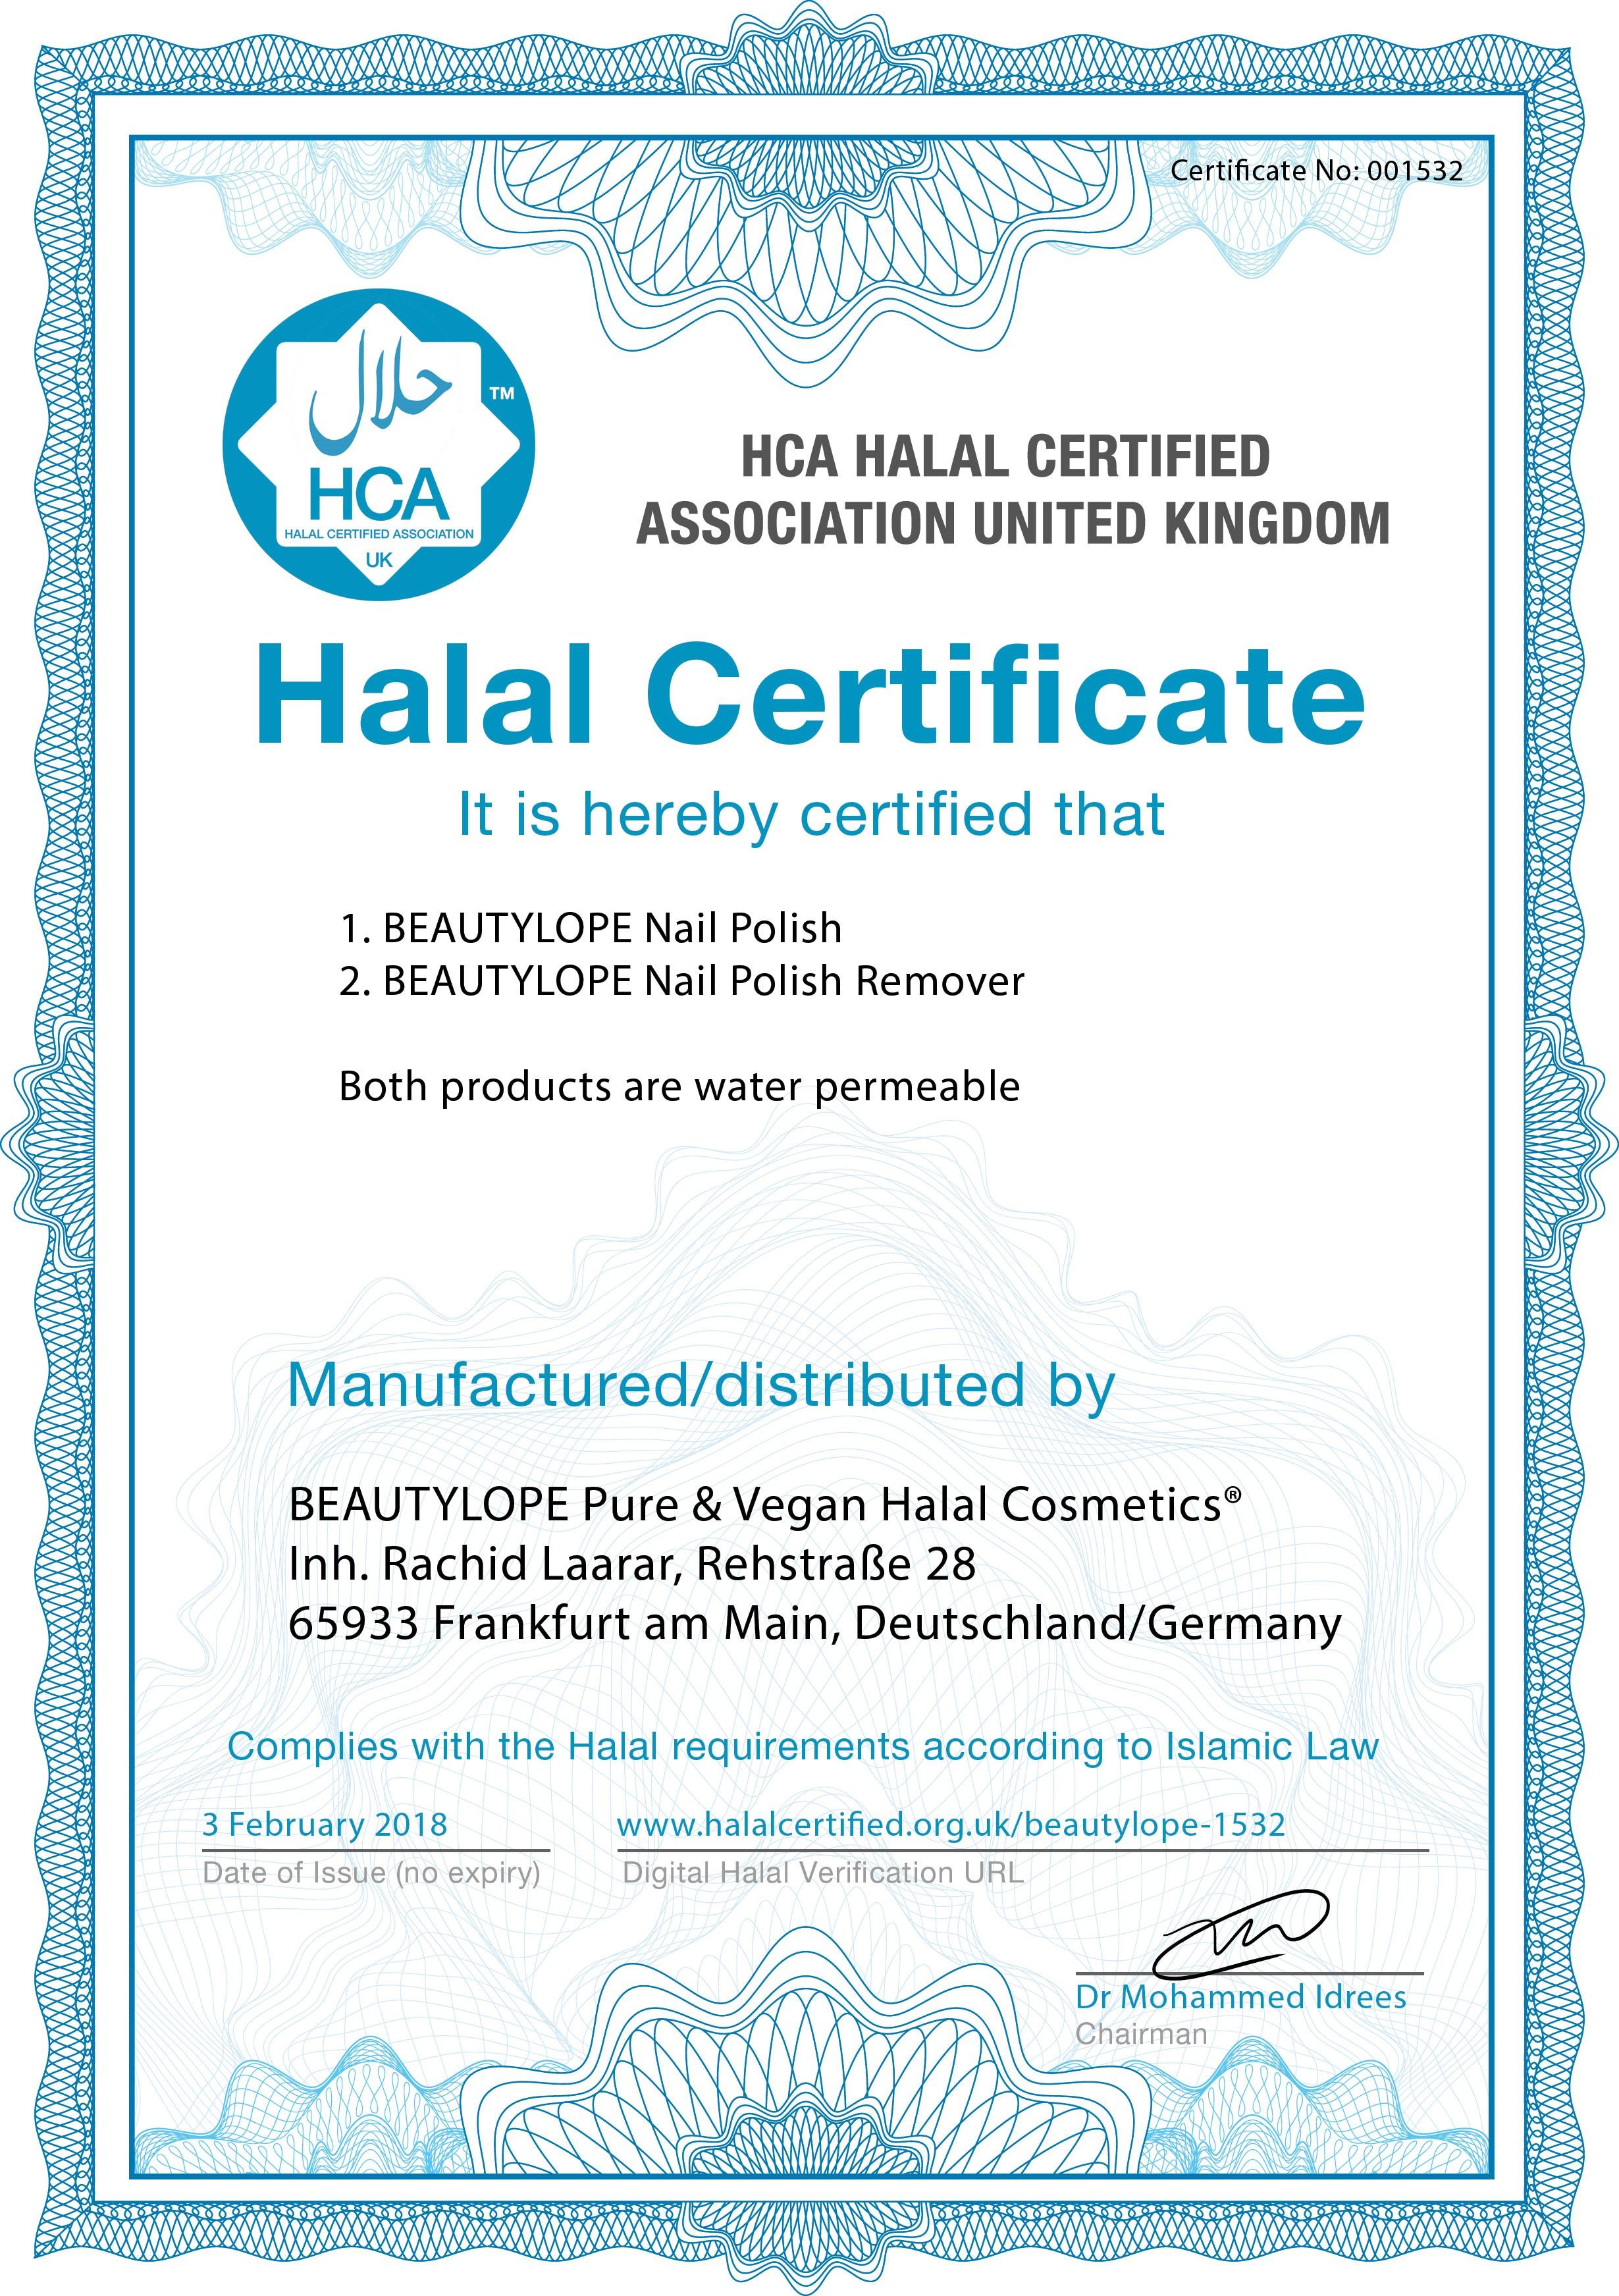 HCA-Zertifikat-neu-Nagellackentferner-Nagellack-Long-Lasting5aa8321260cff